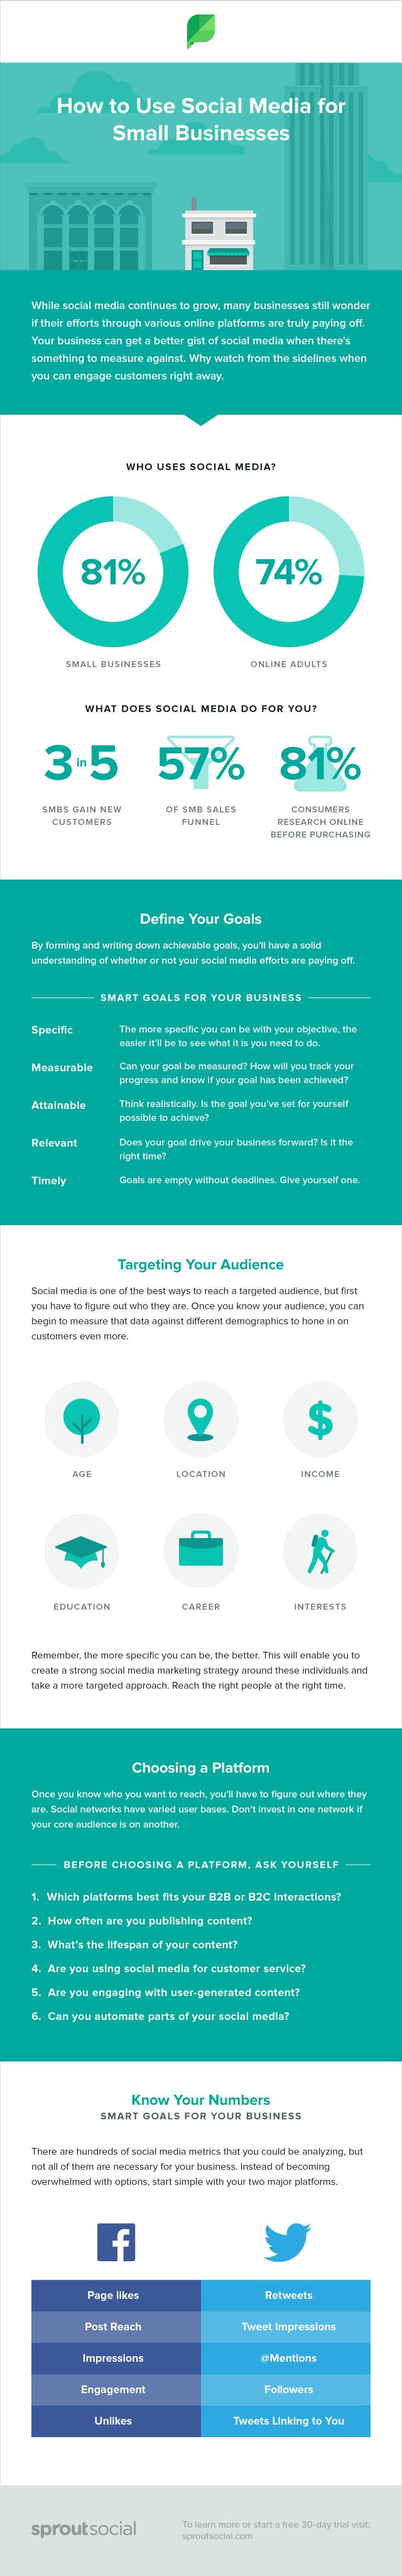 Infographie 237 - smb-social-media